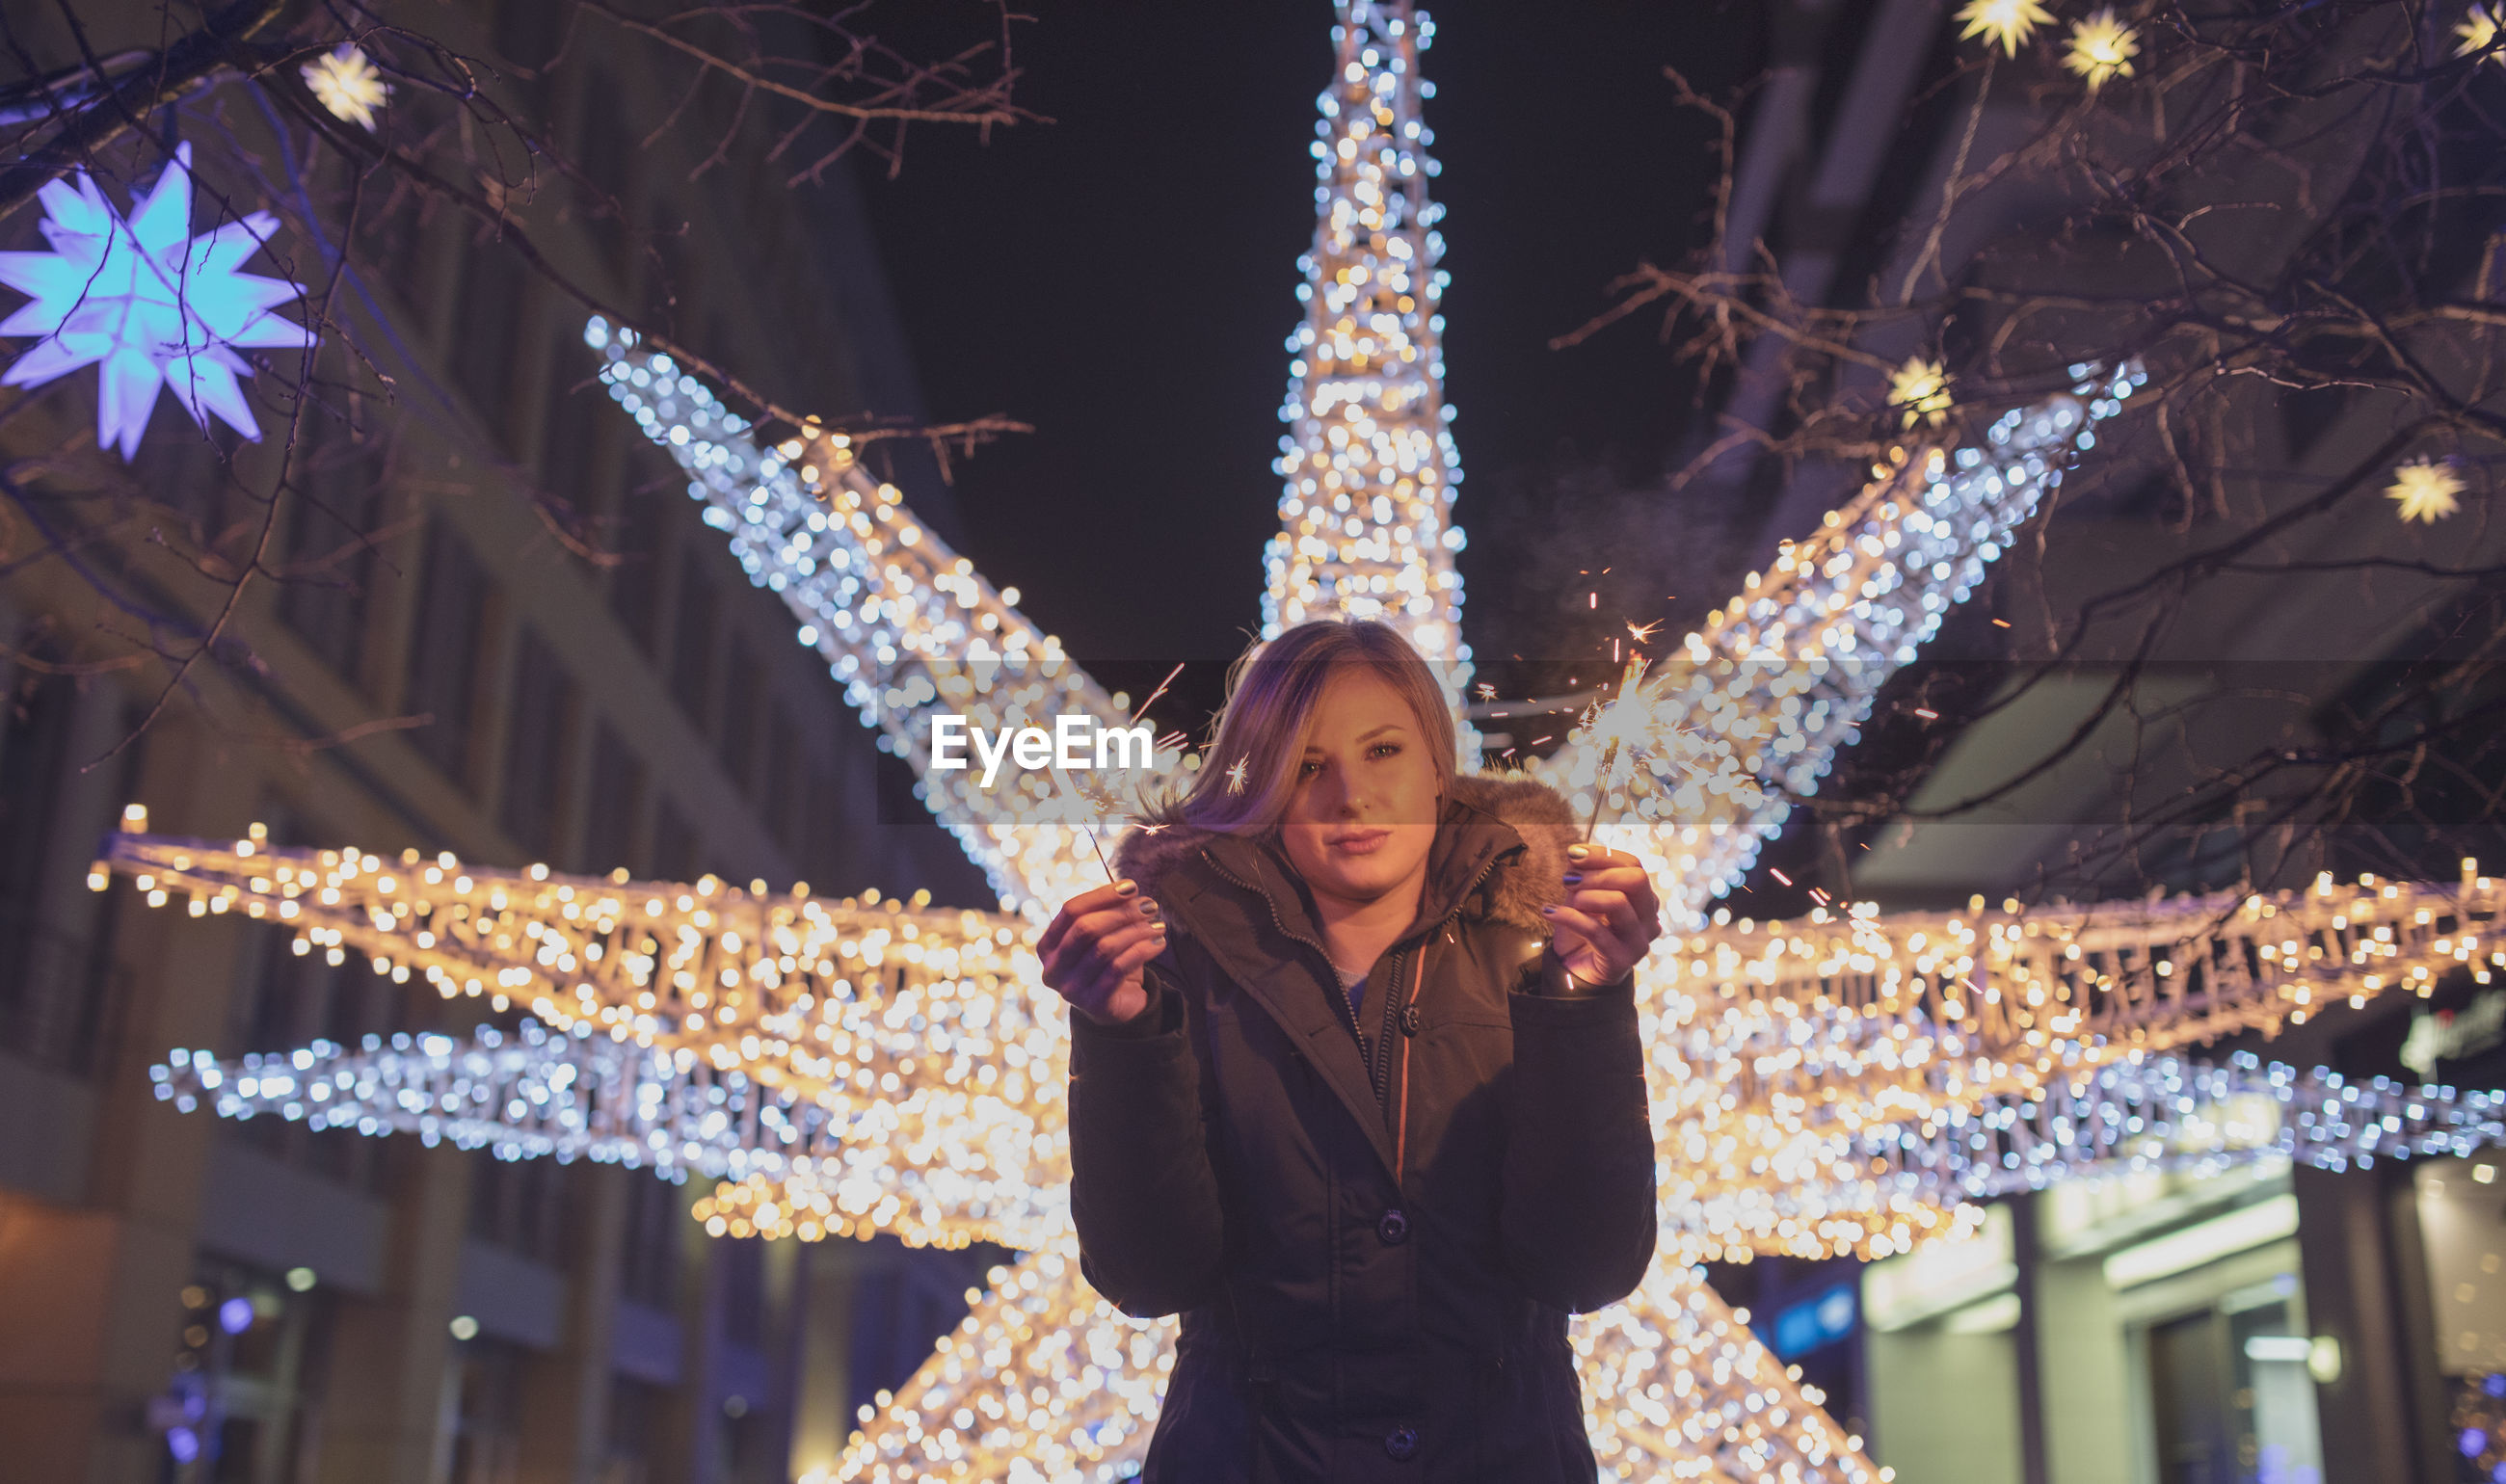 Portrait of woman holding illuminated sparkler at night